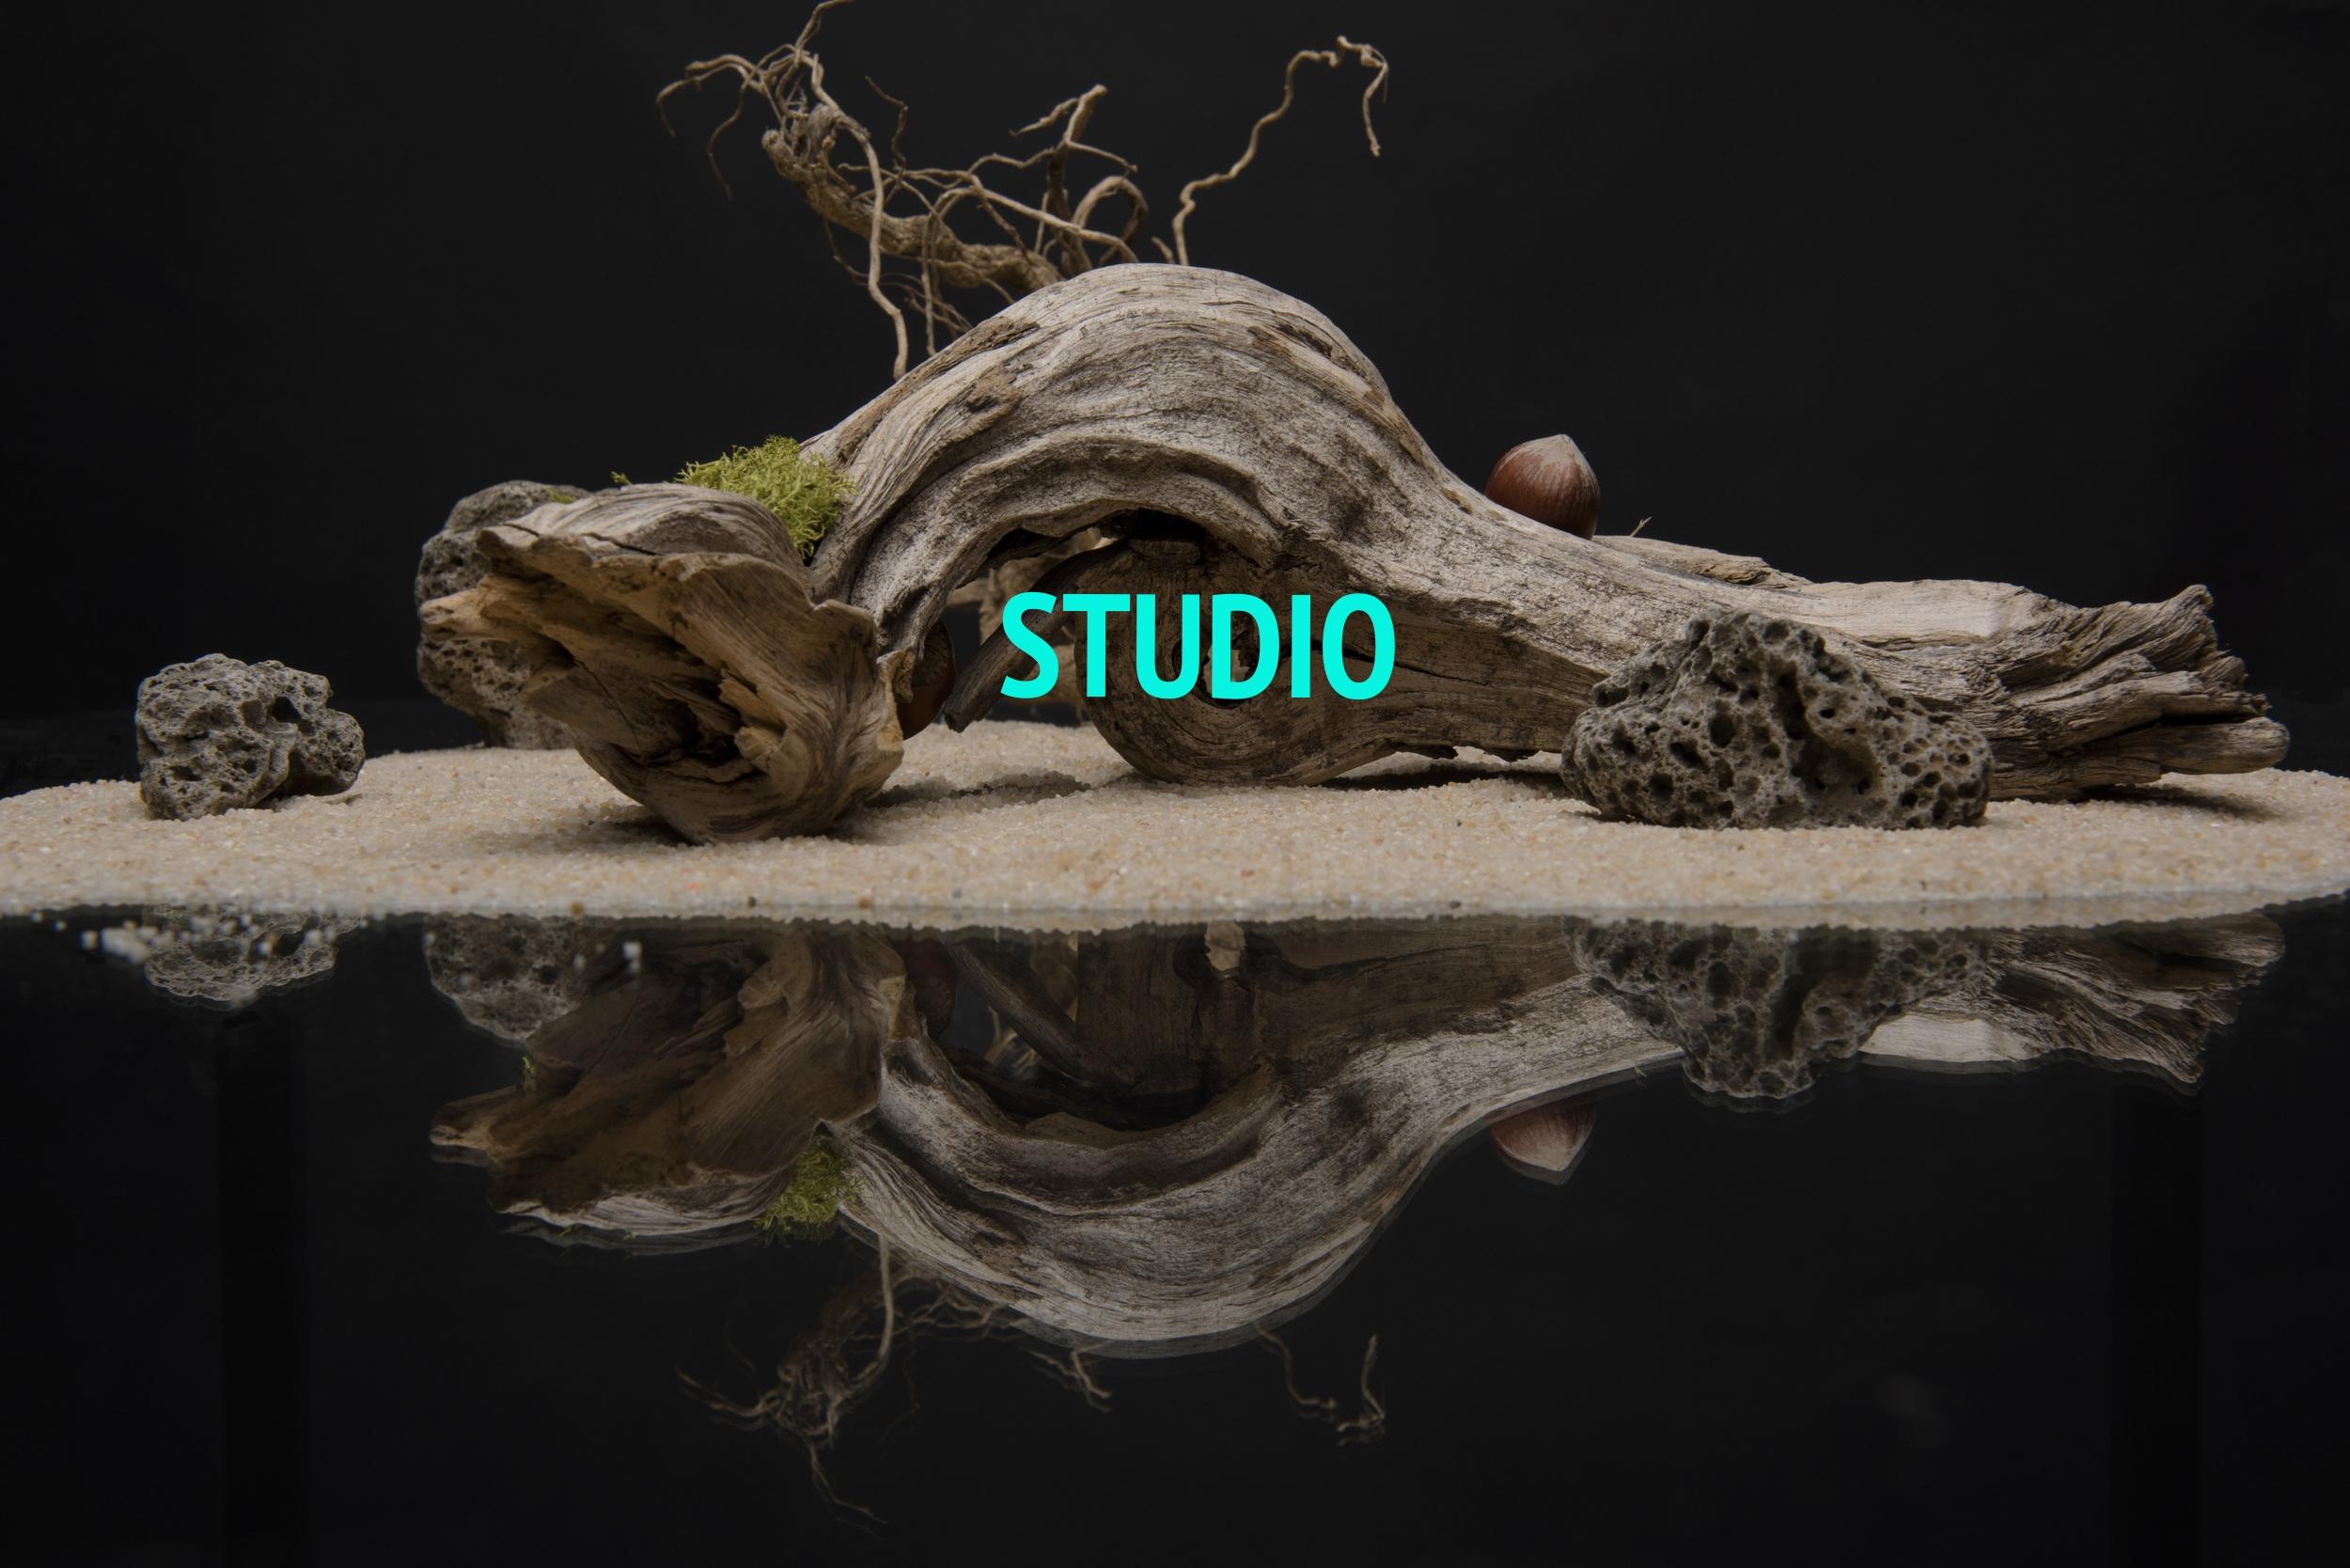 Studio still life shooting